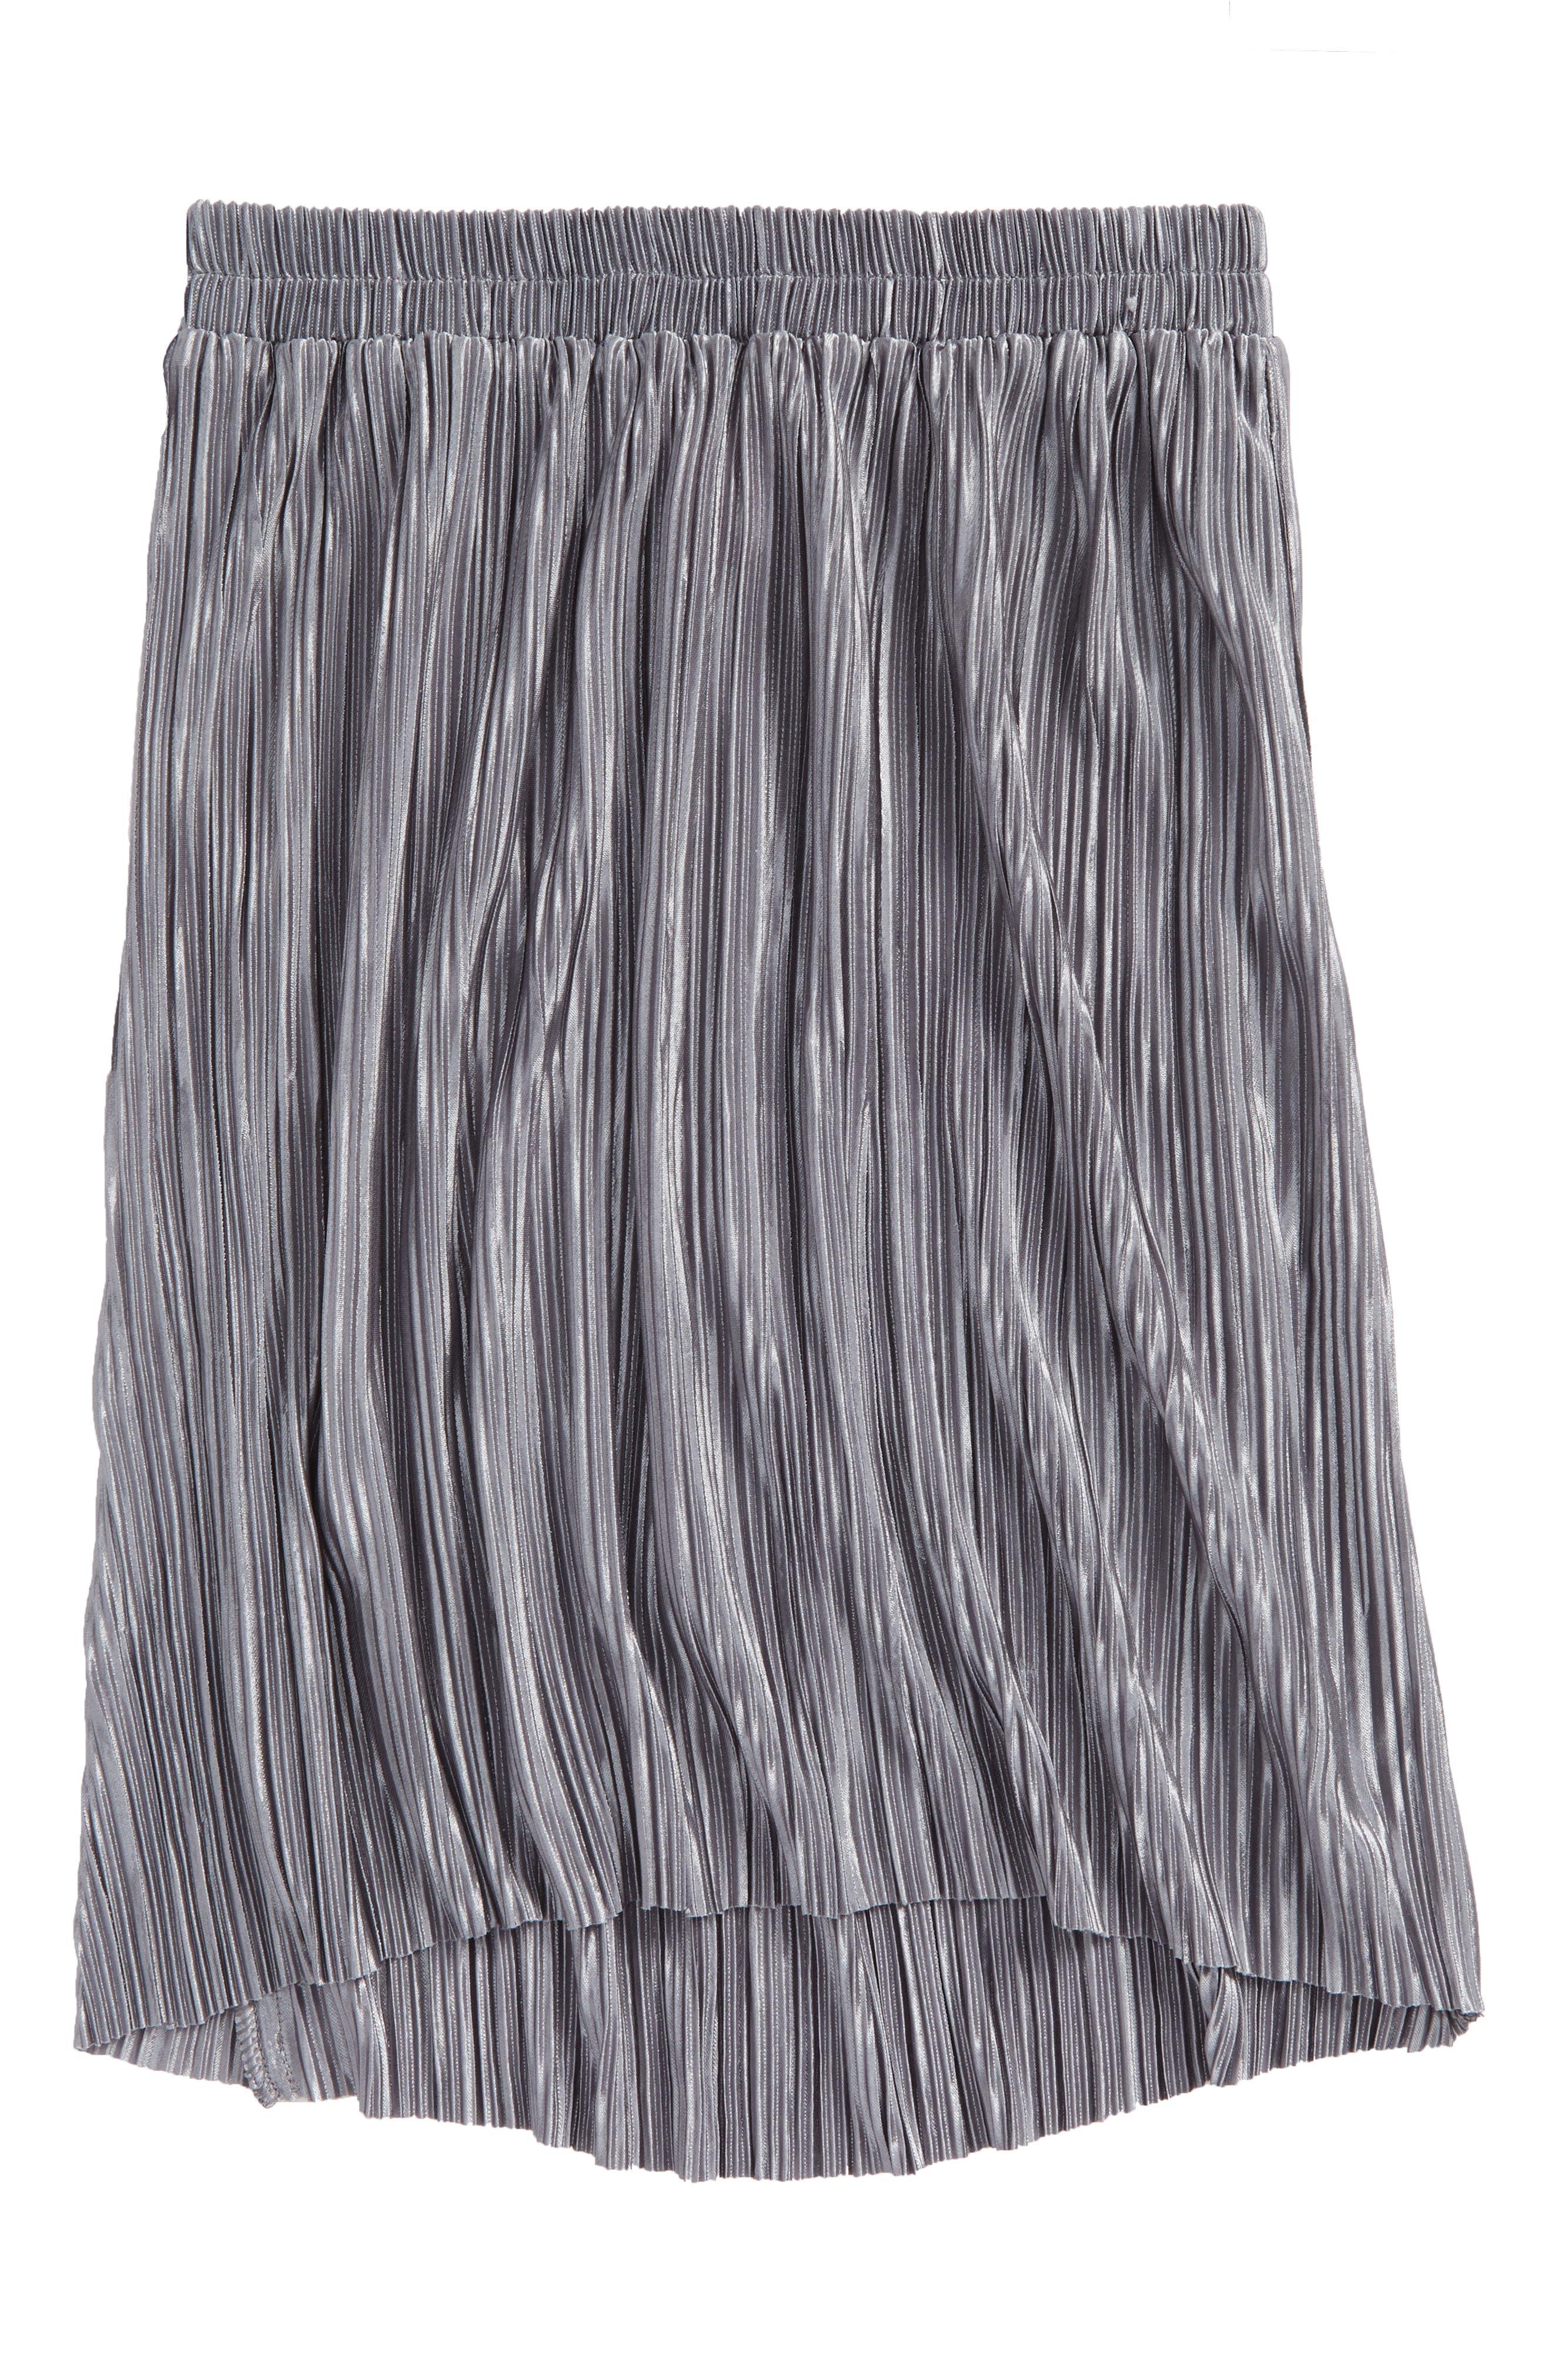 Pleated Metallic Skirt,                         Main,                         color,